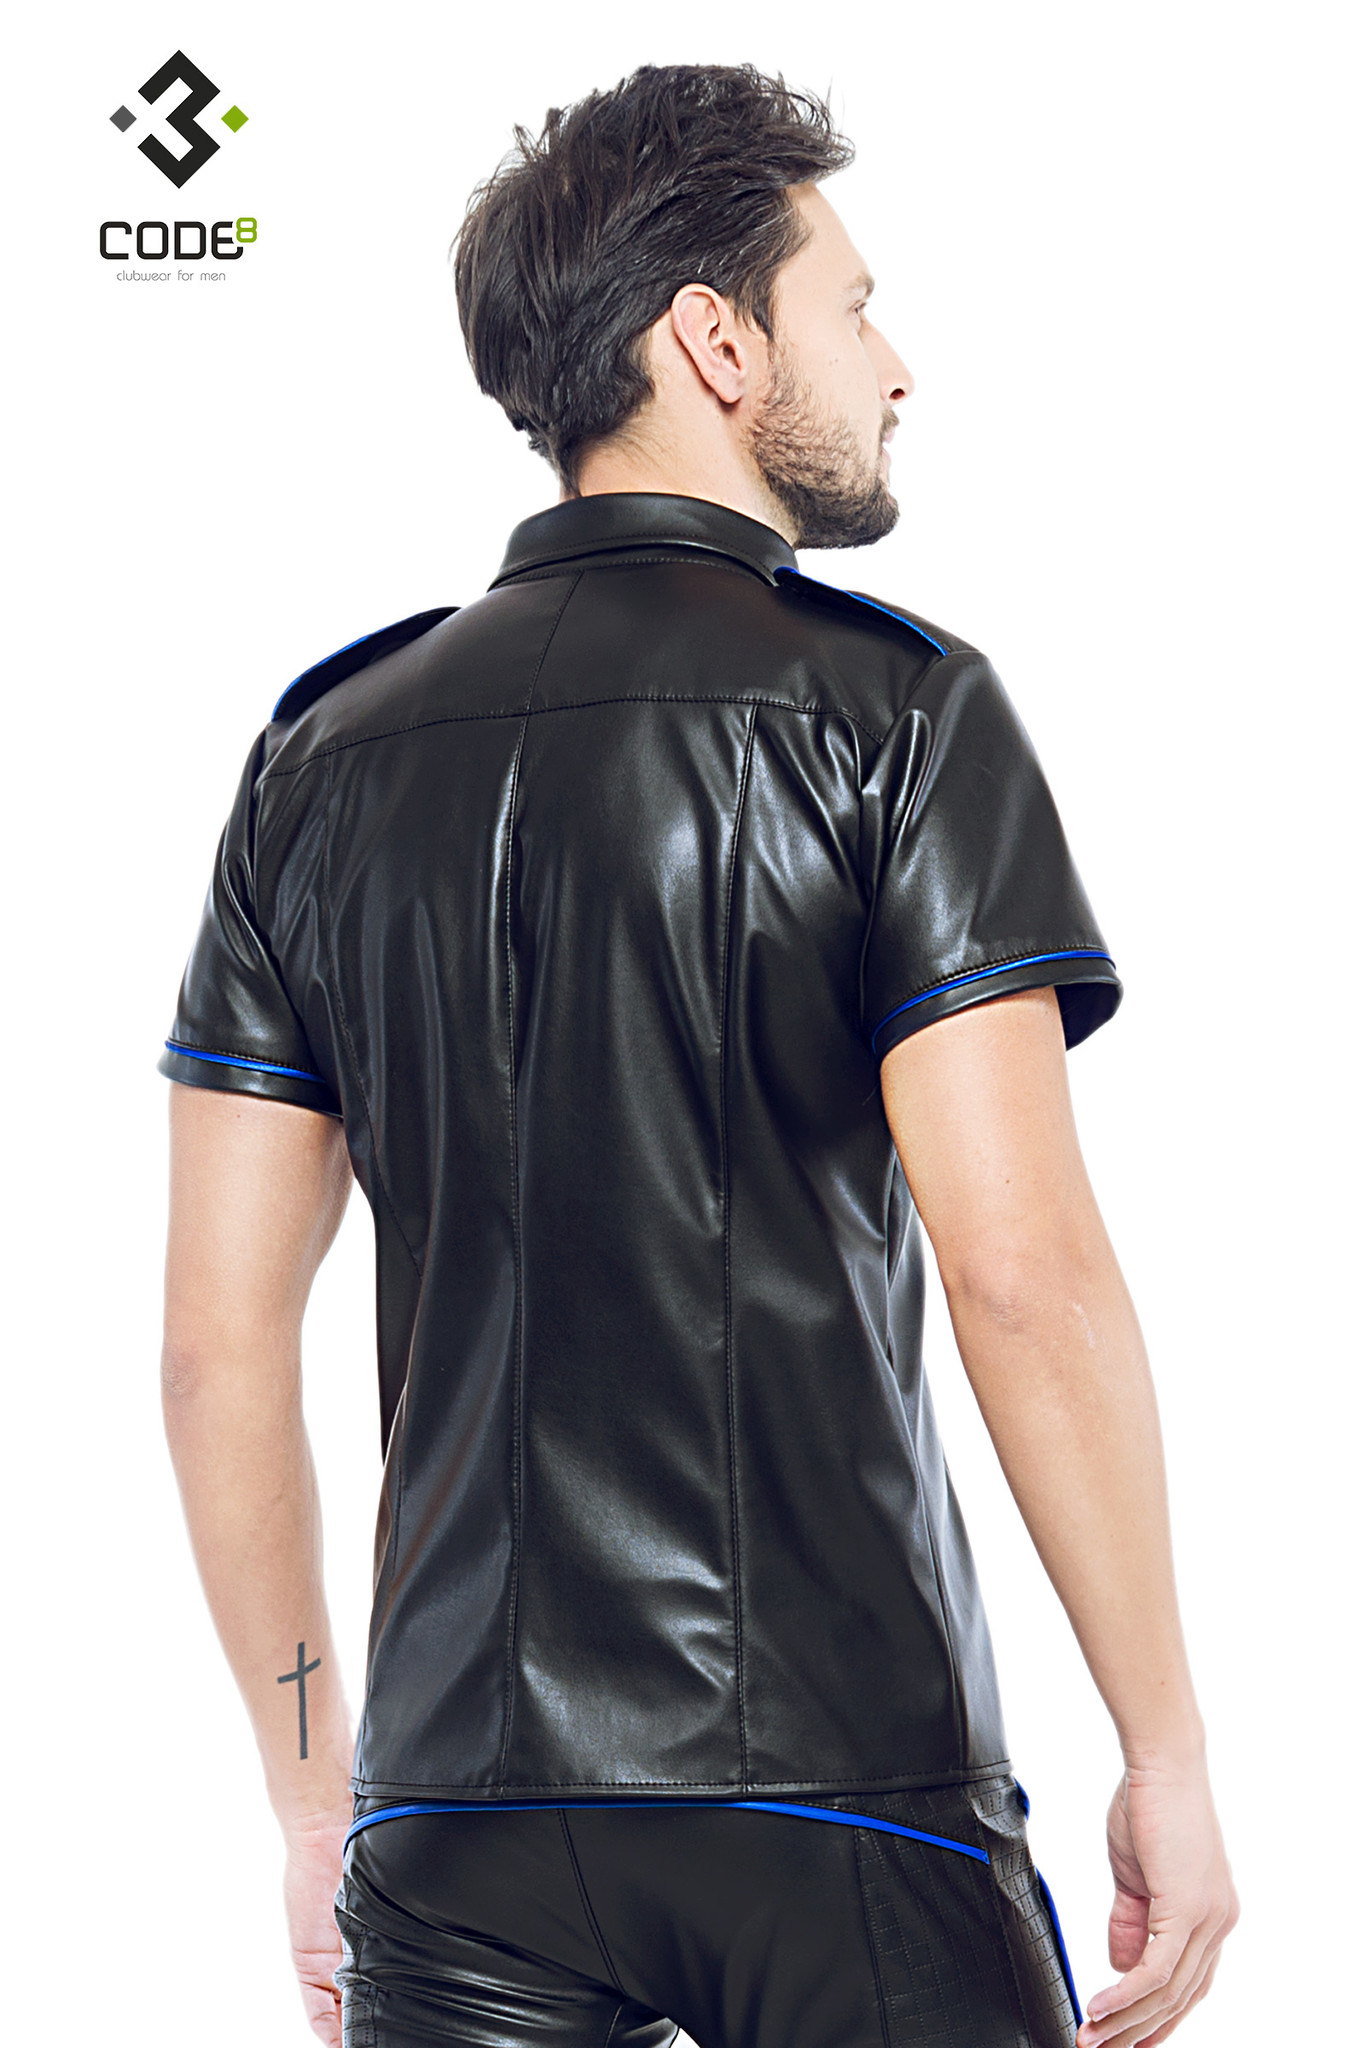 * Code8 by XXX COLLECTION Shirt van hoge kwaliteit PU-Leer